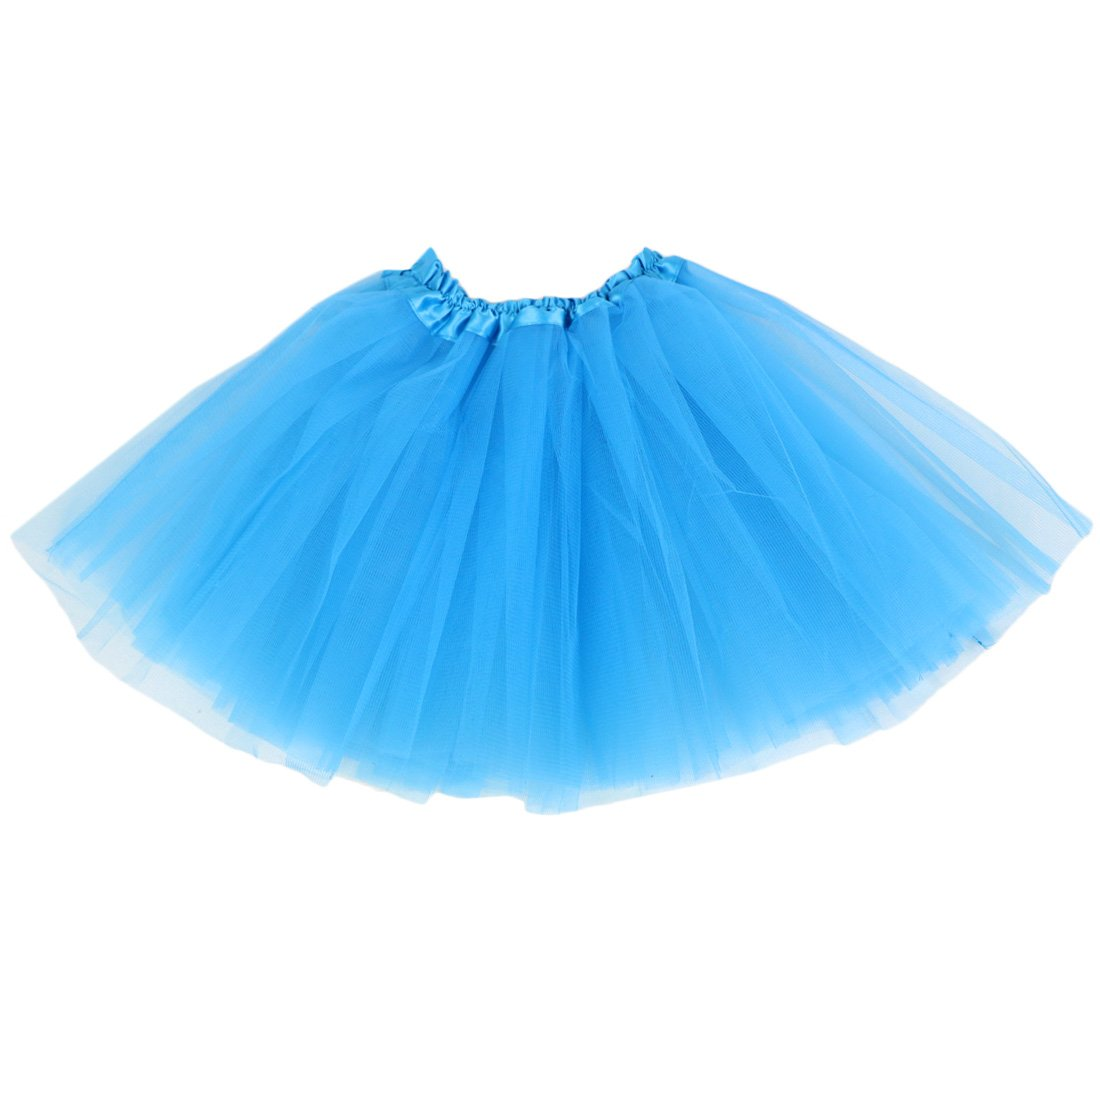 Amazon.com: kilofly 6pc Girls Ballet Tutu Kids Birthday Princess ...